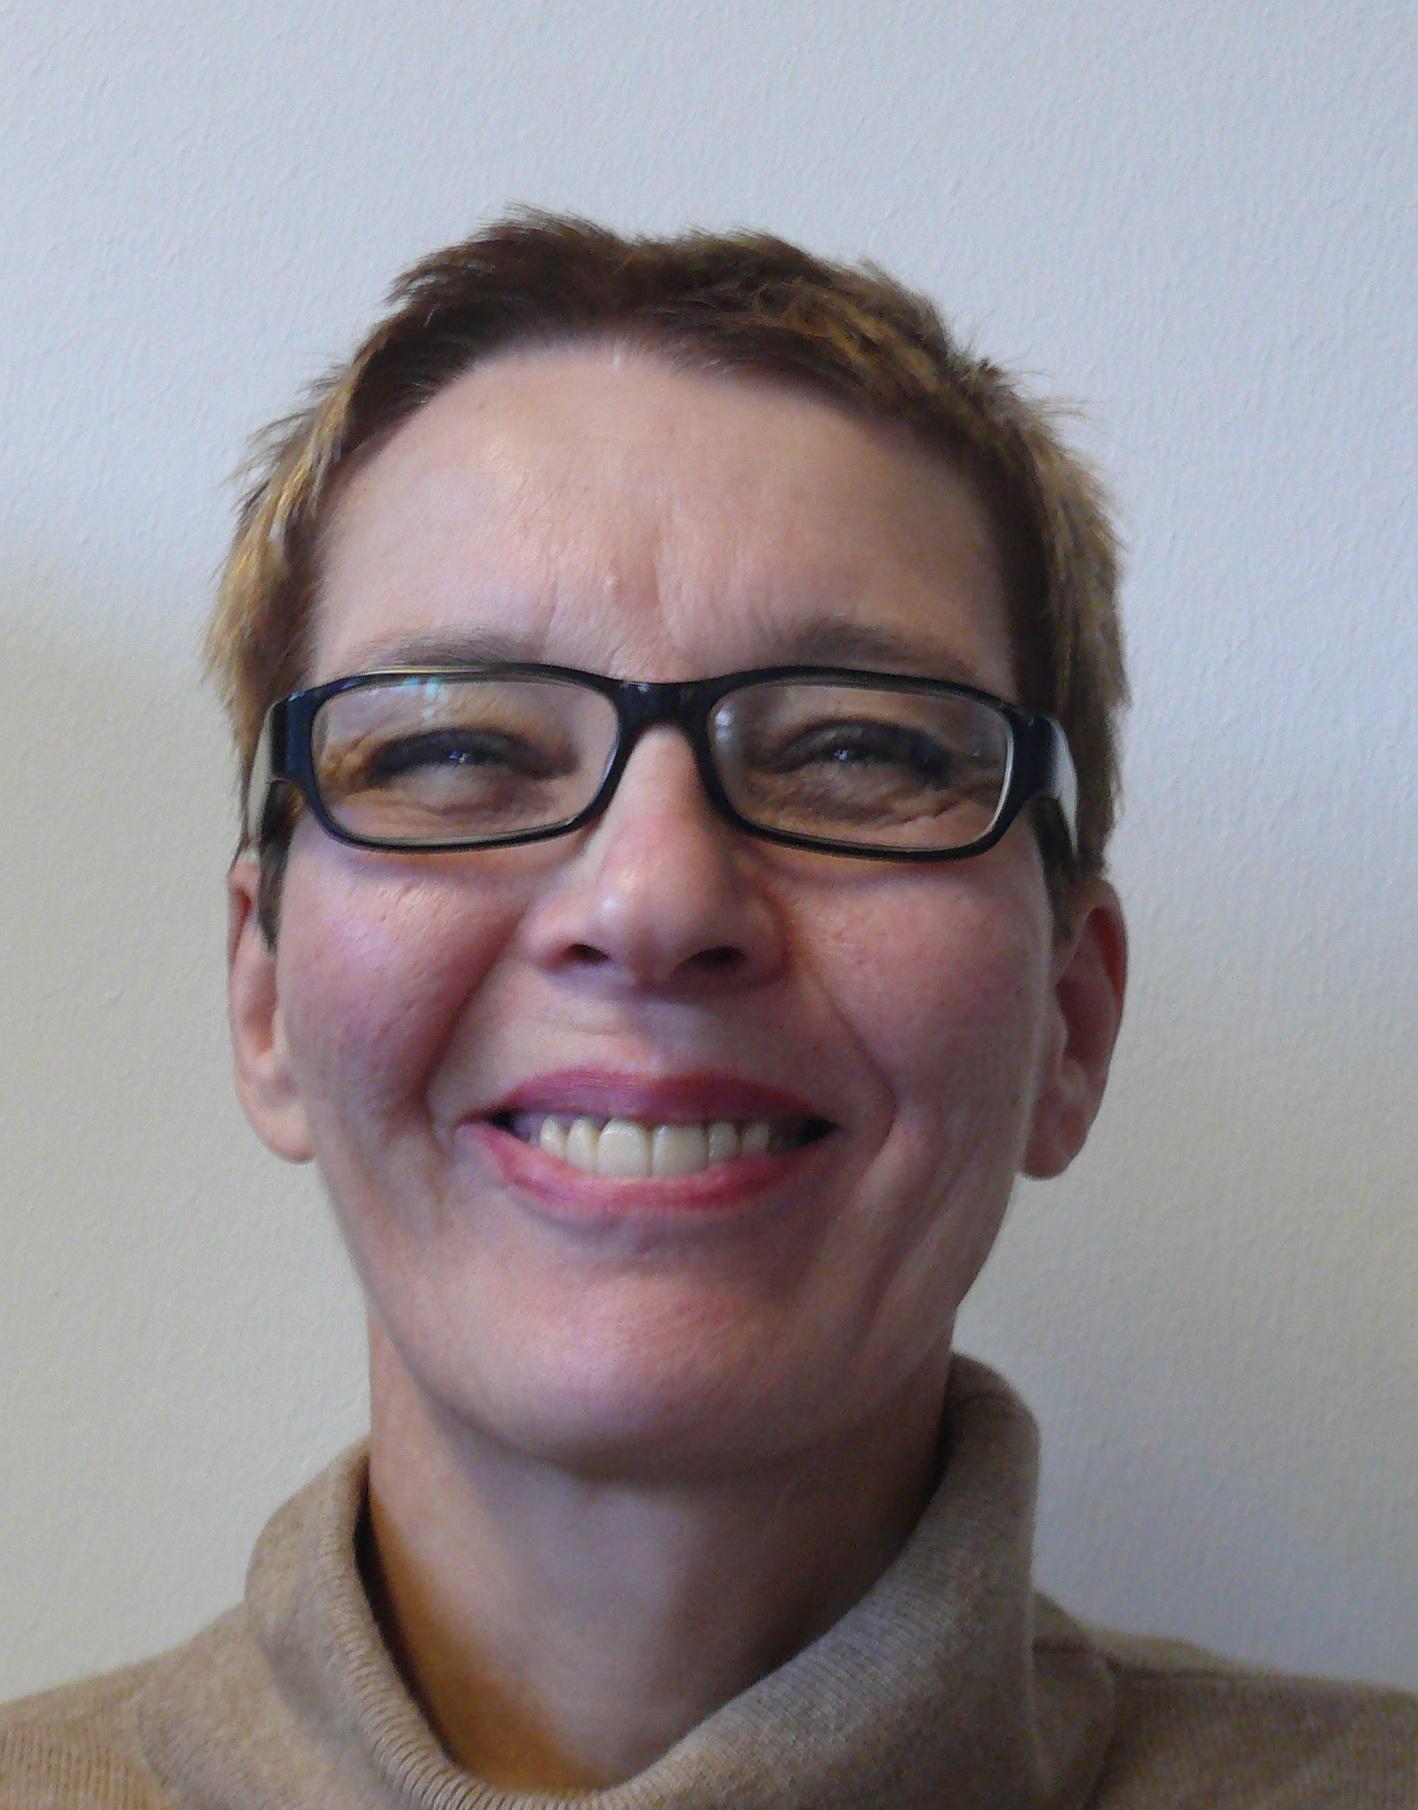 Martina Rosenkranz